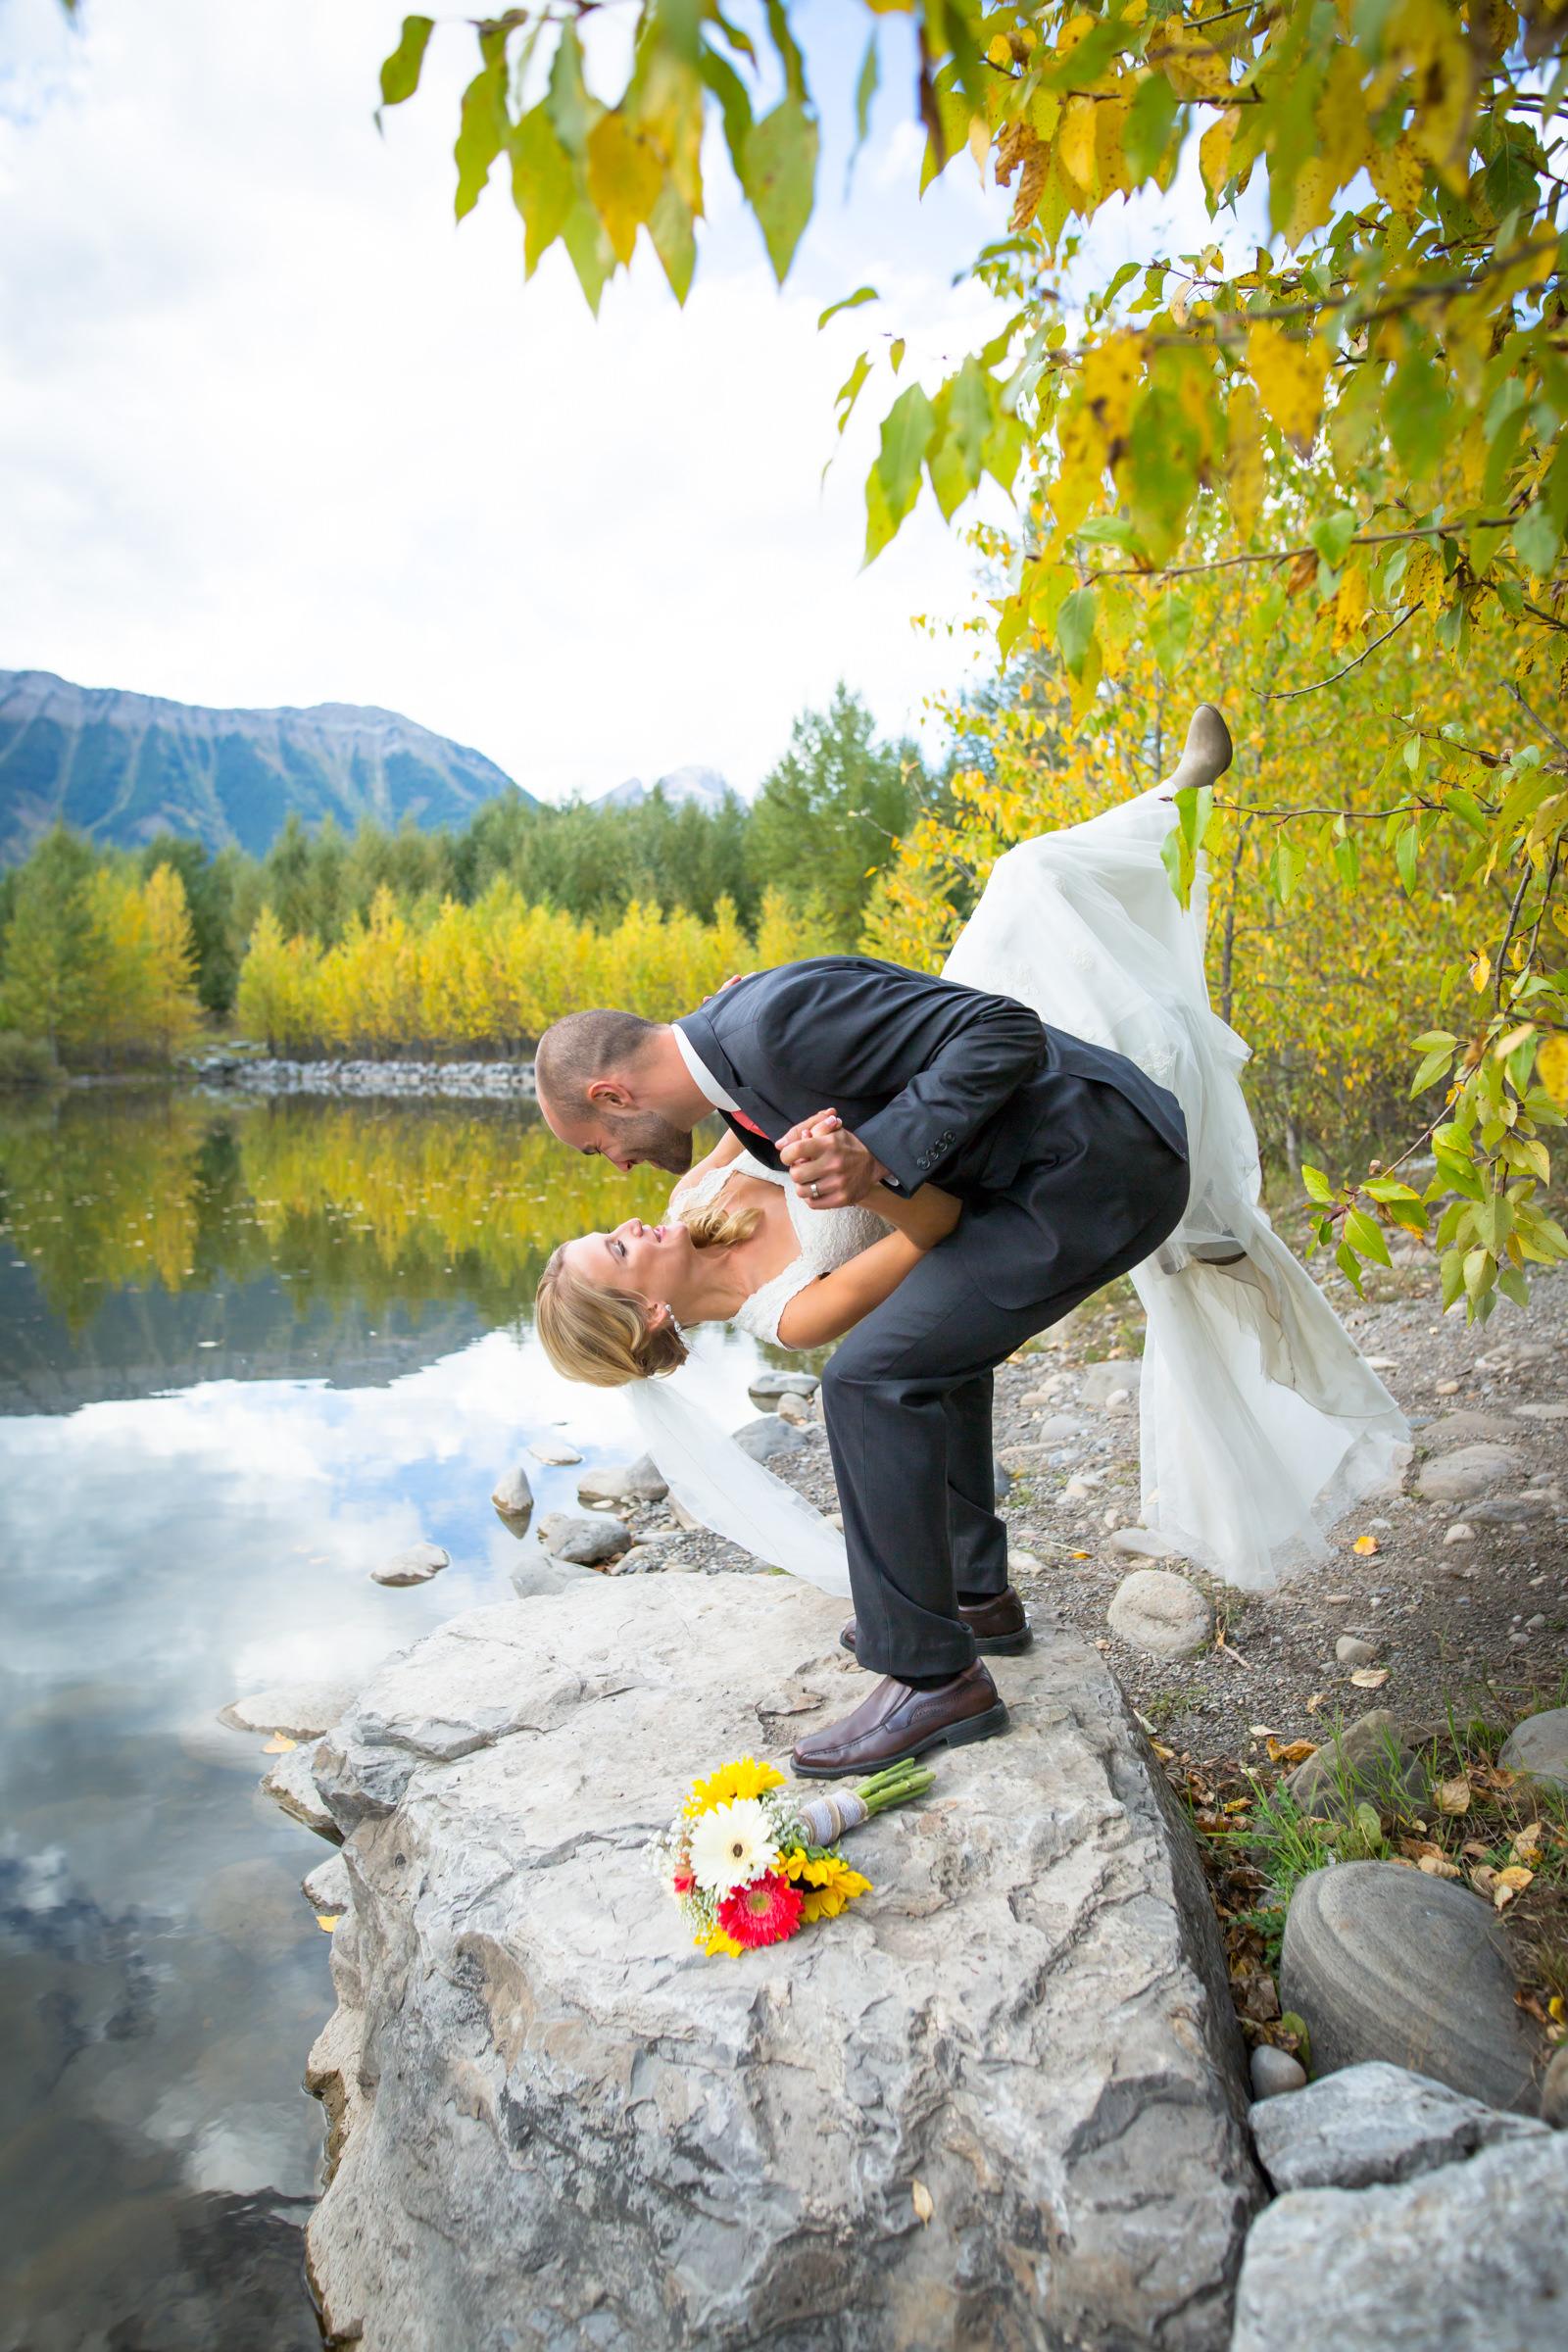 Nick Nault Wedding Images_-9.jpg